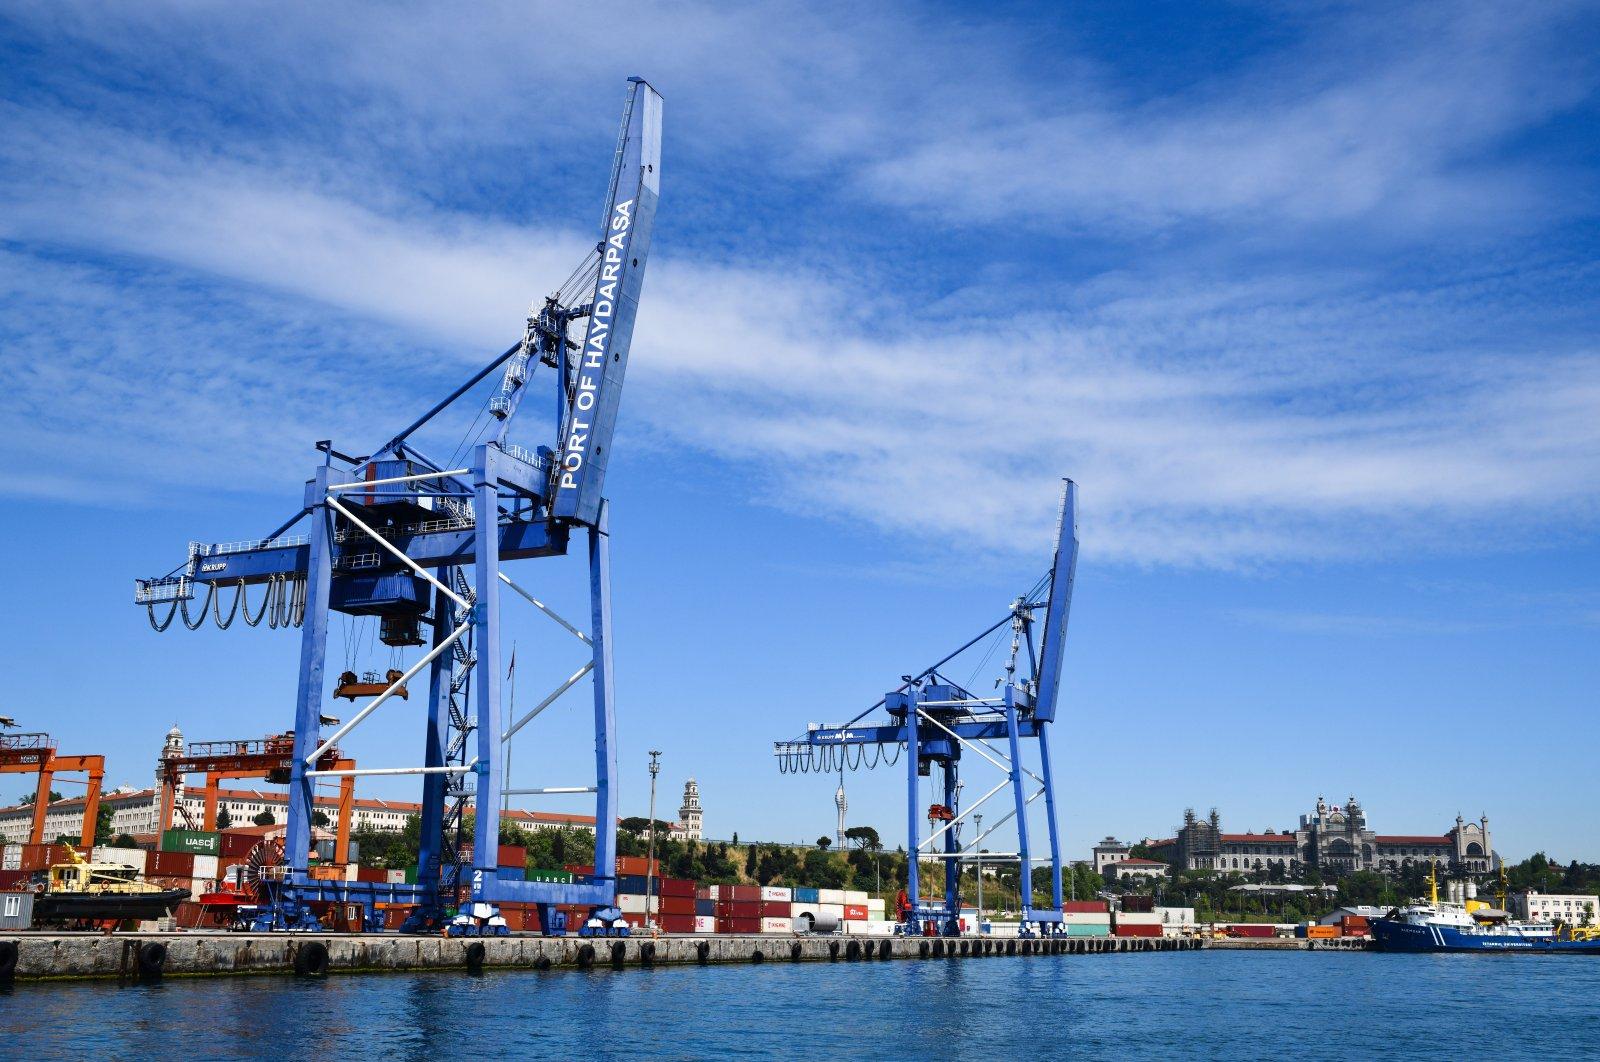 Port equipment waits for shipments at the Haydarpaşa Port in Kadıköy, Istanbul, Turkey, May 5, 2021. (Photo by Shutterstock)